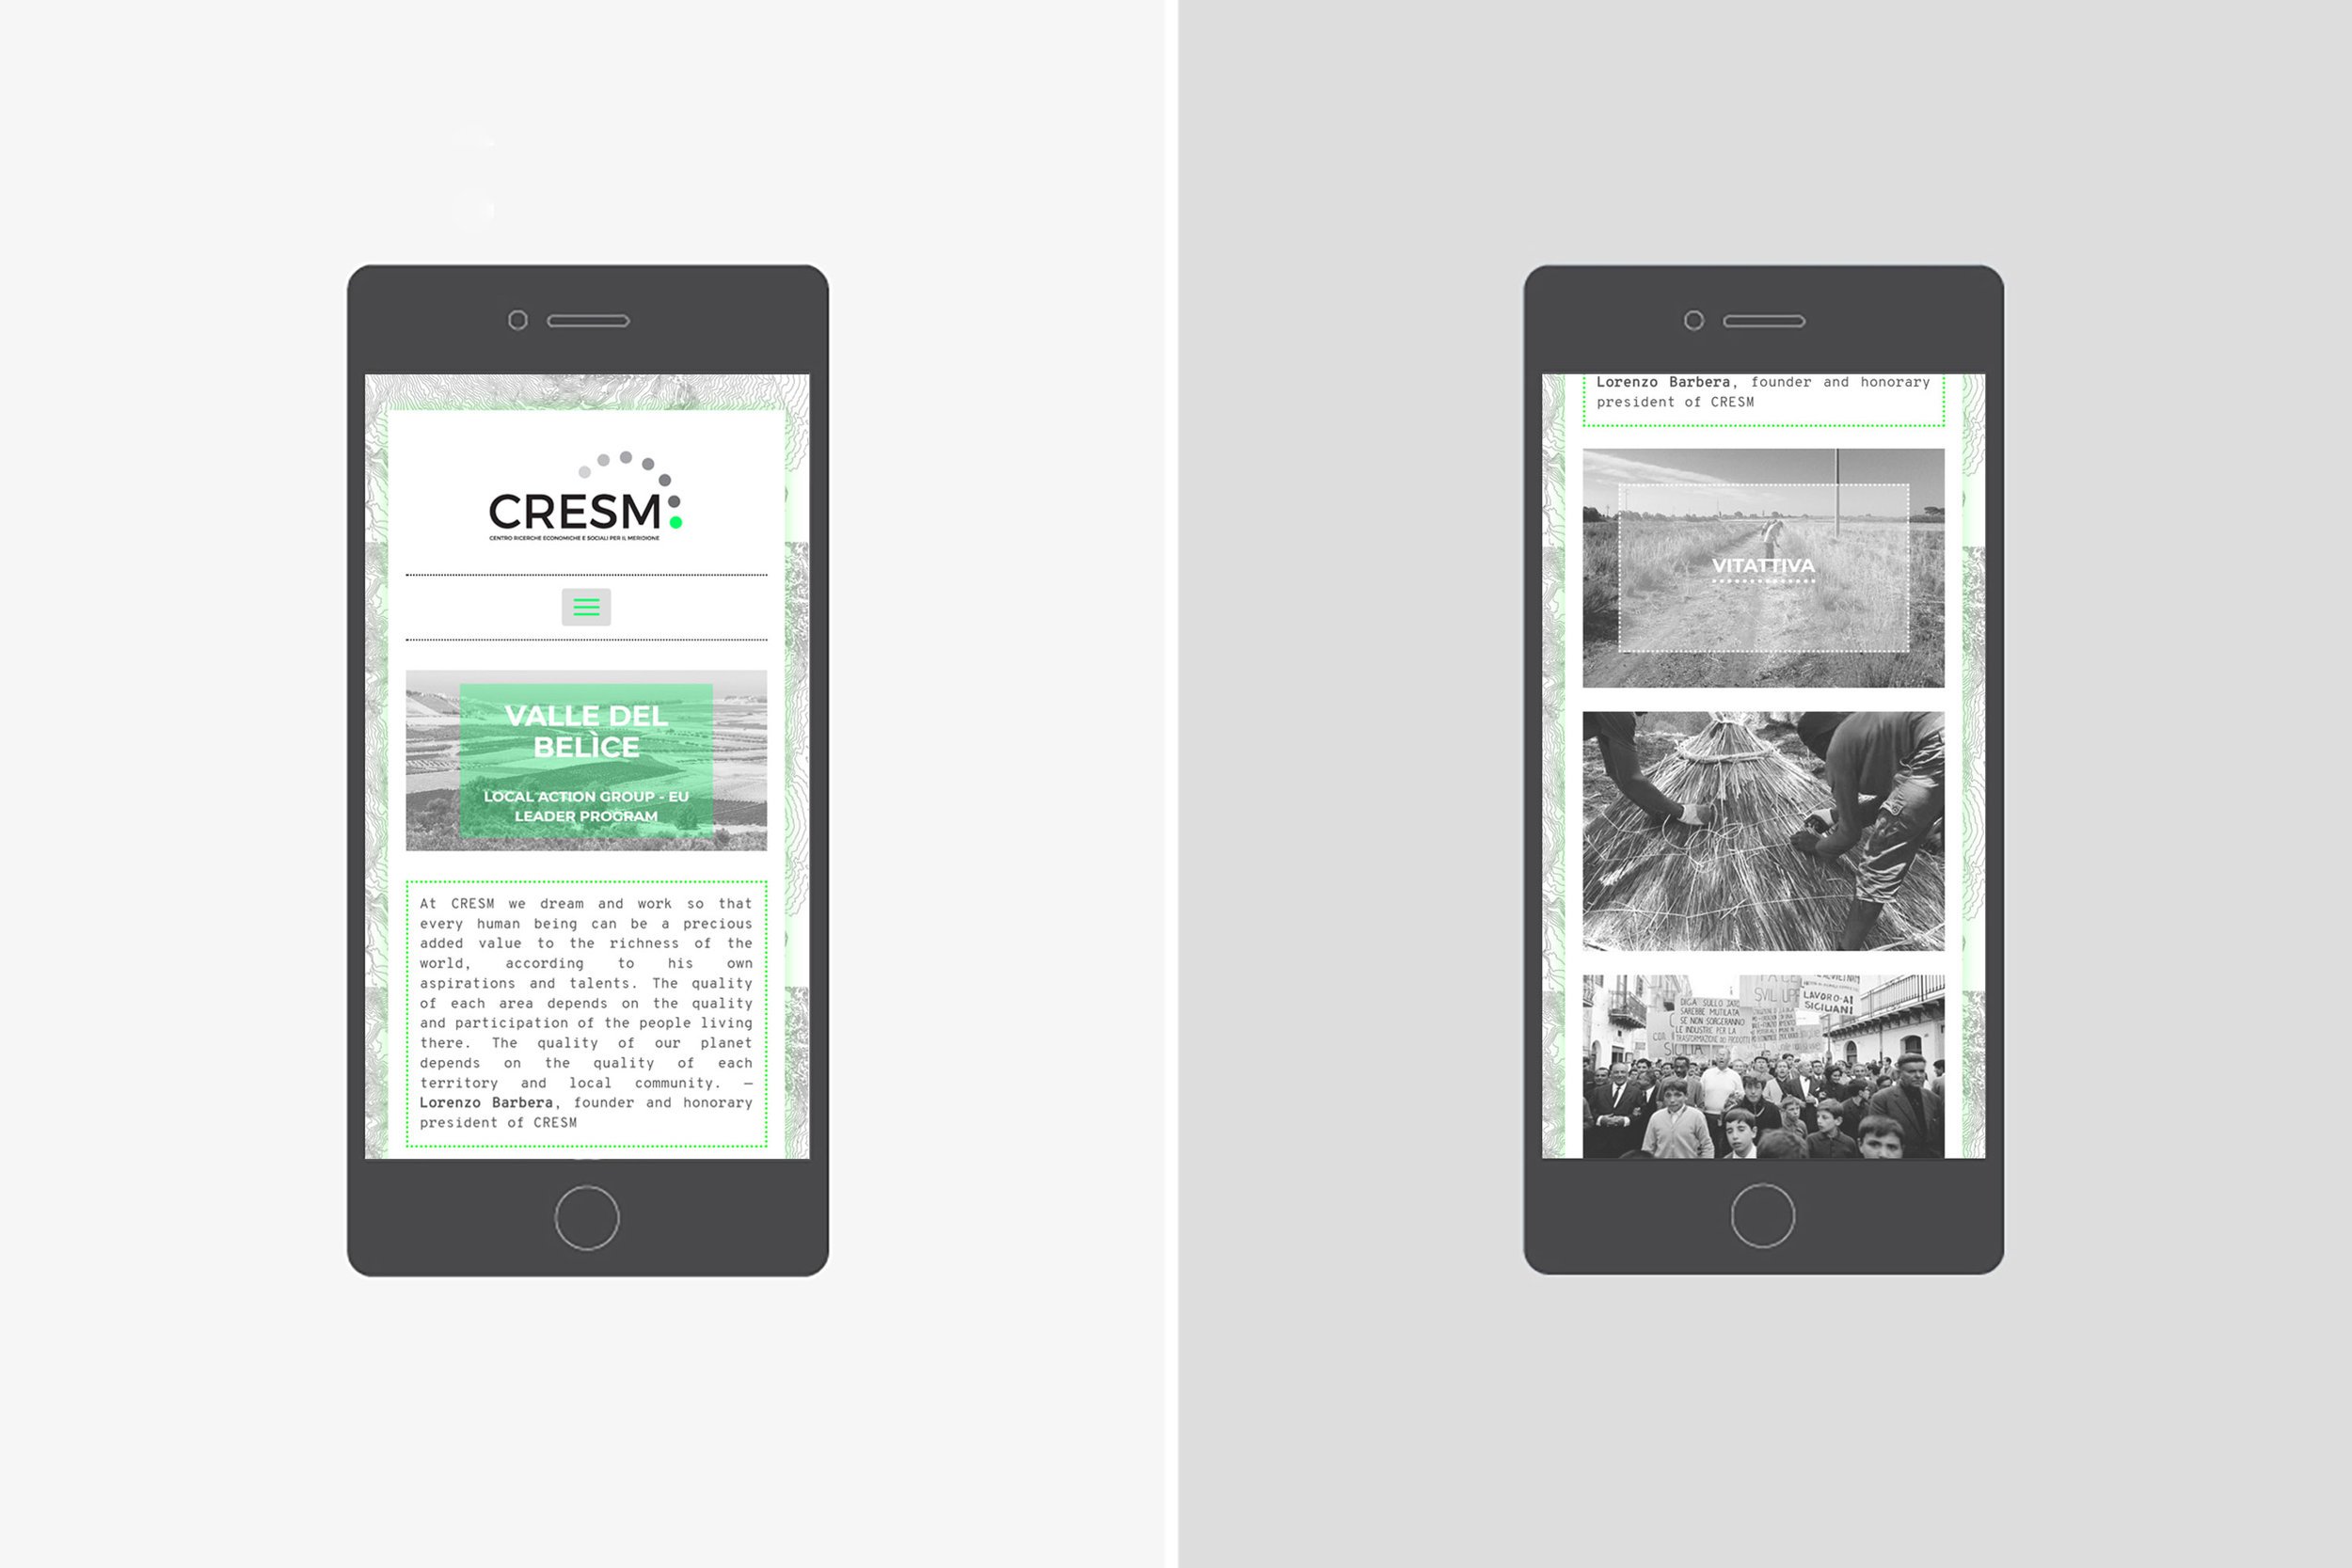 Cresm_MOBILE - Home.jpg